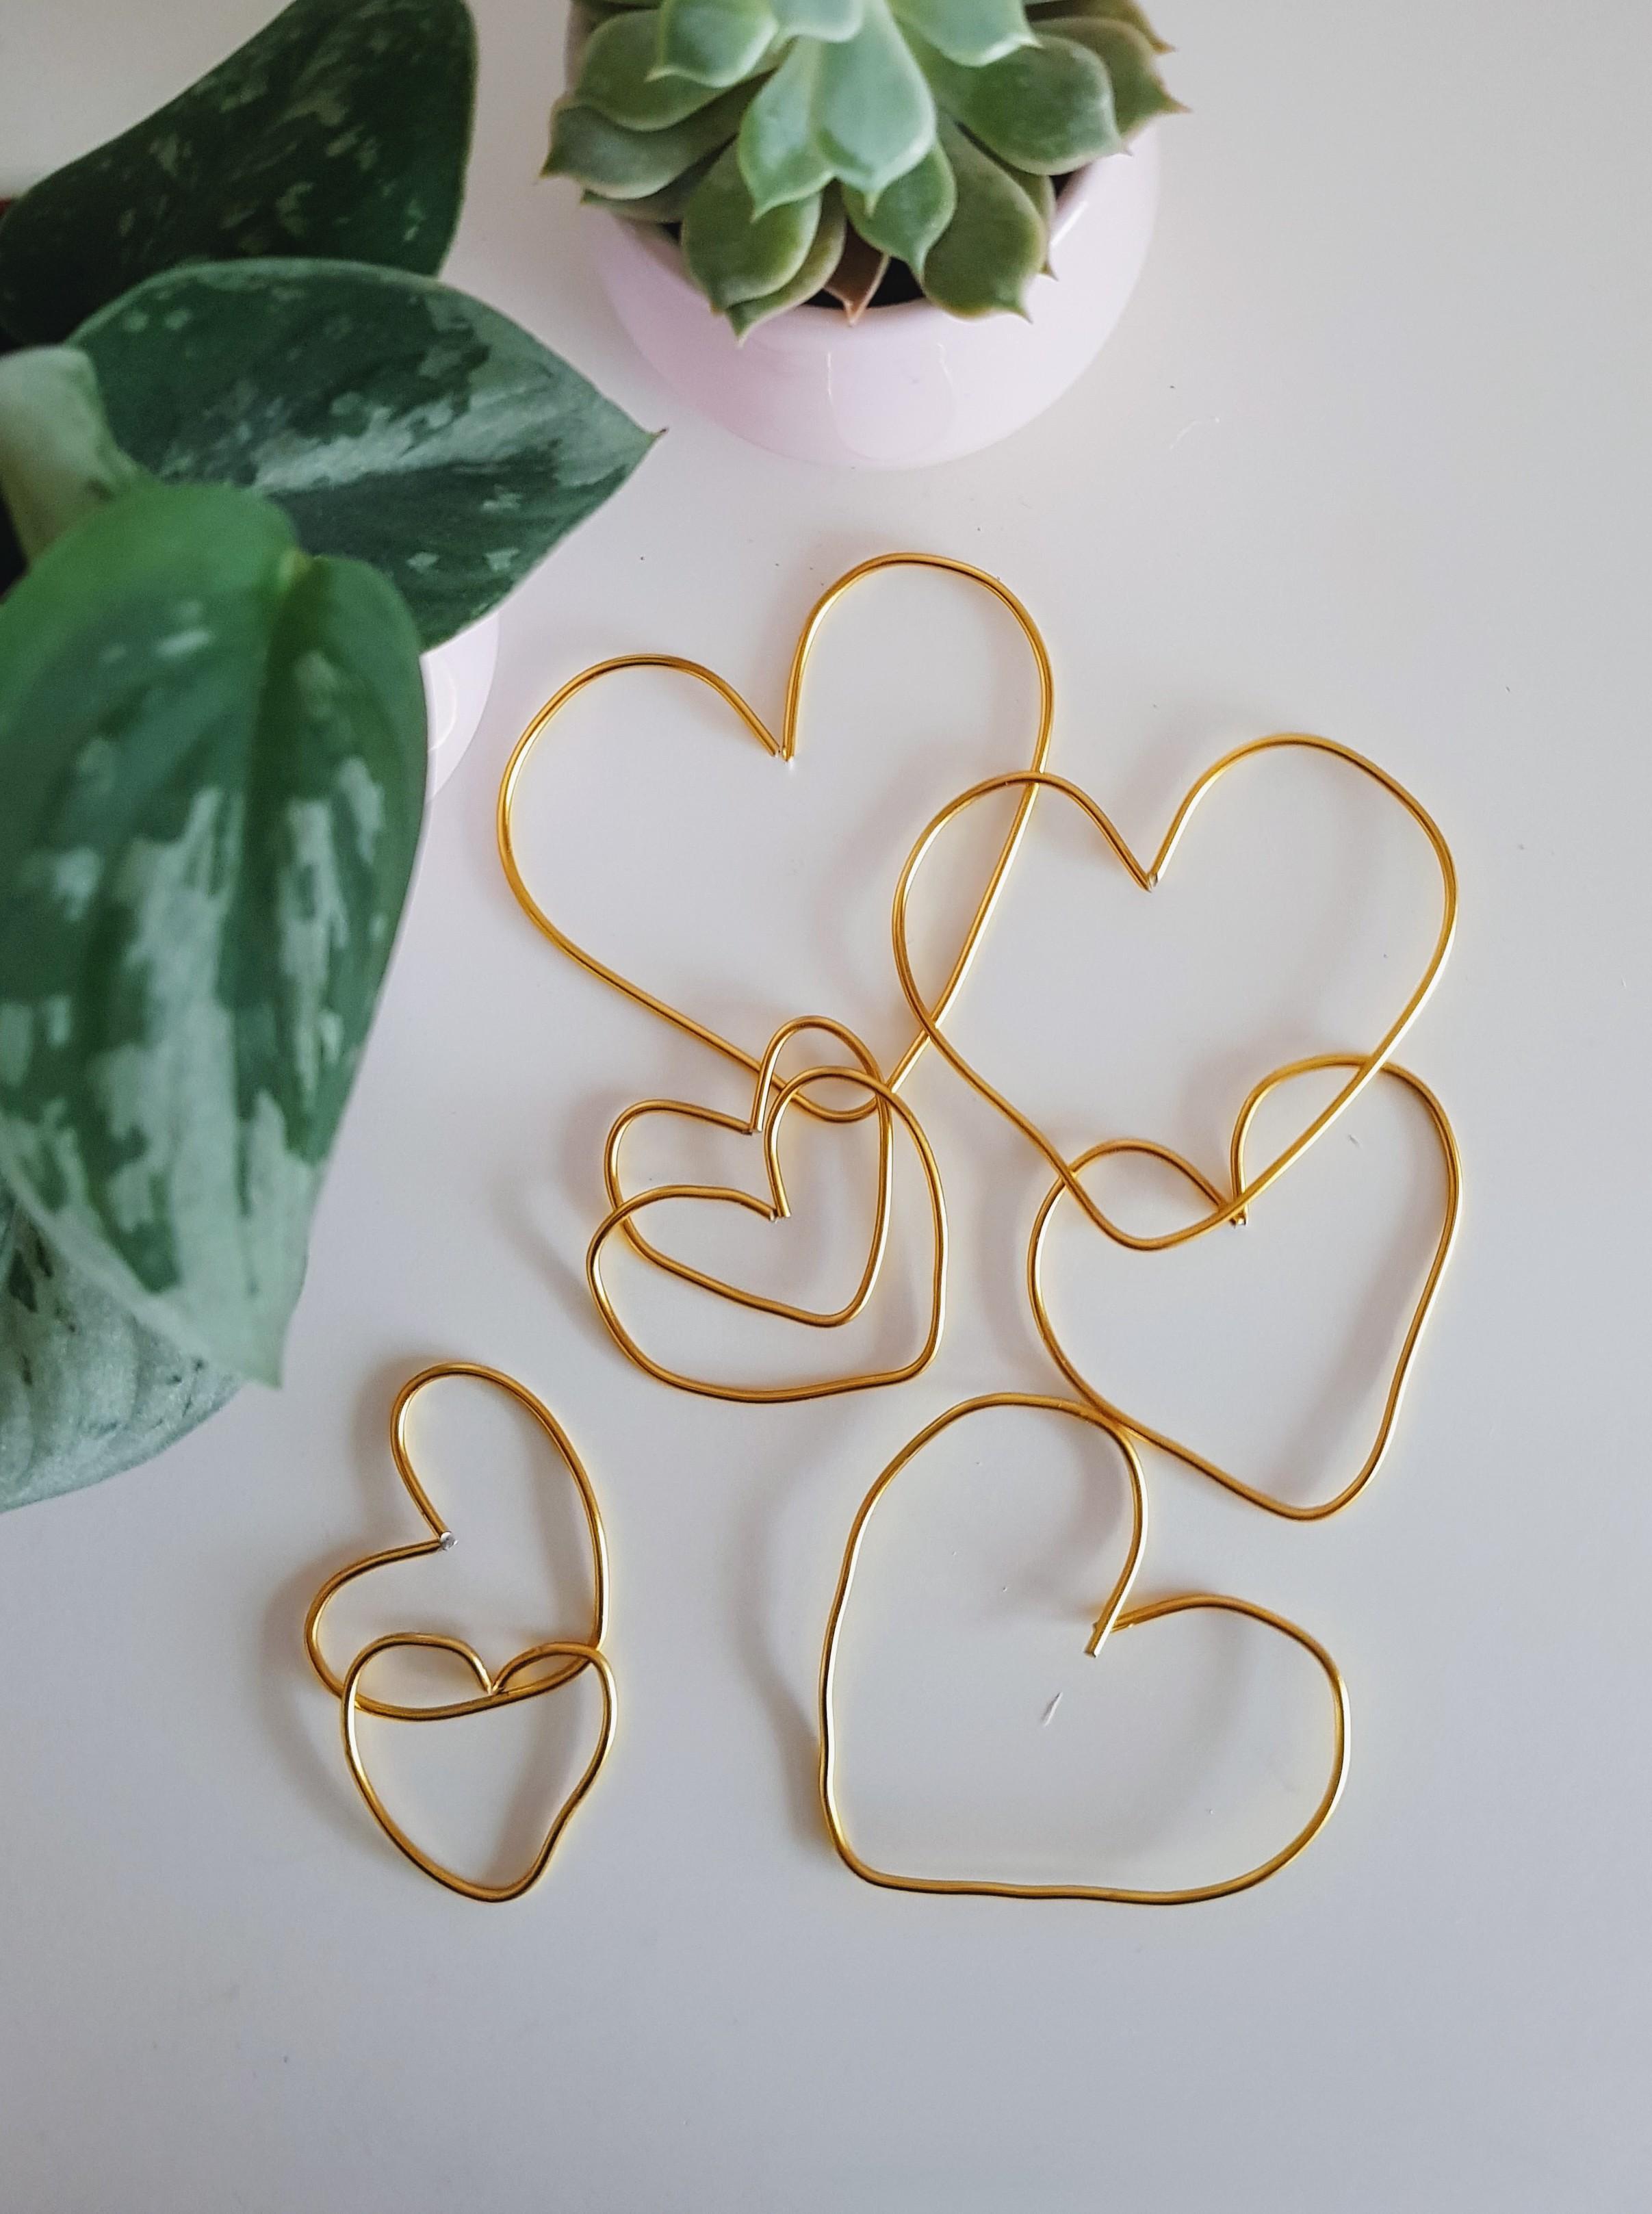 DIY // Simple Heart Ornaments